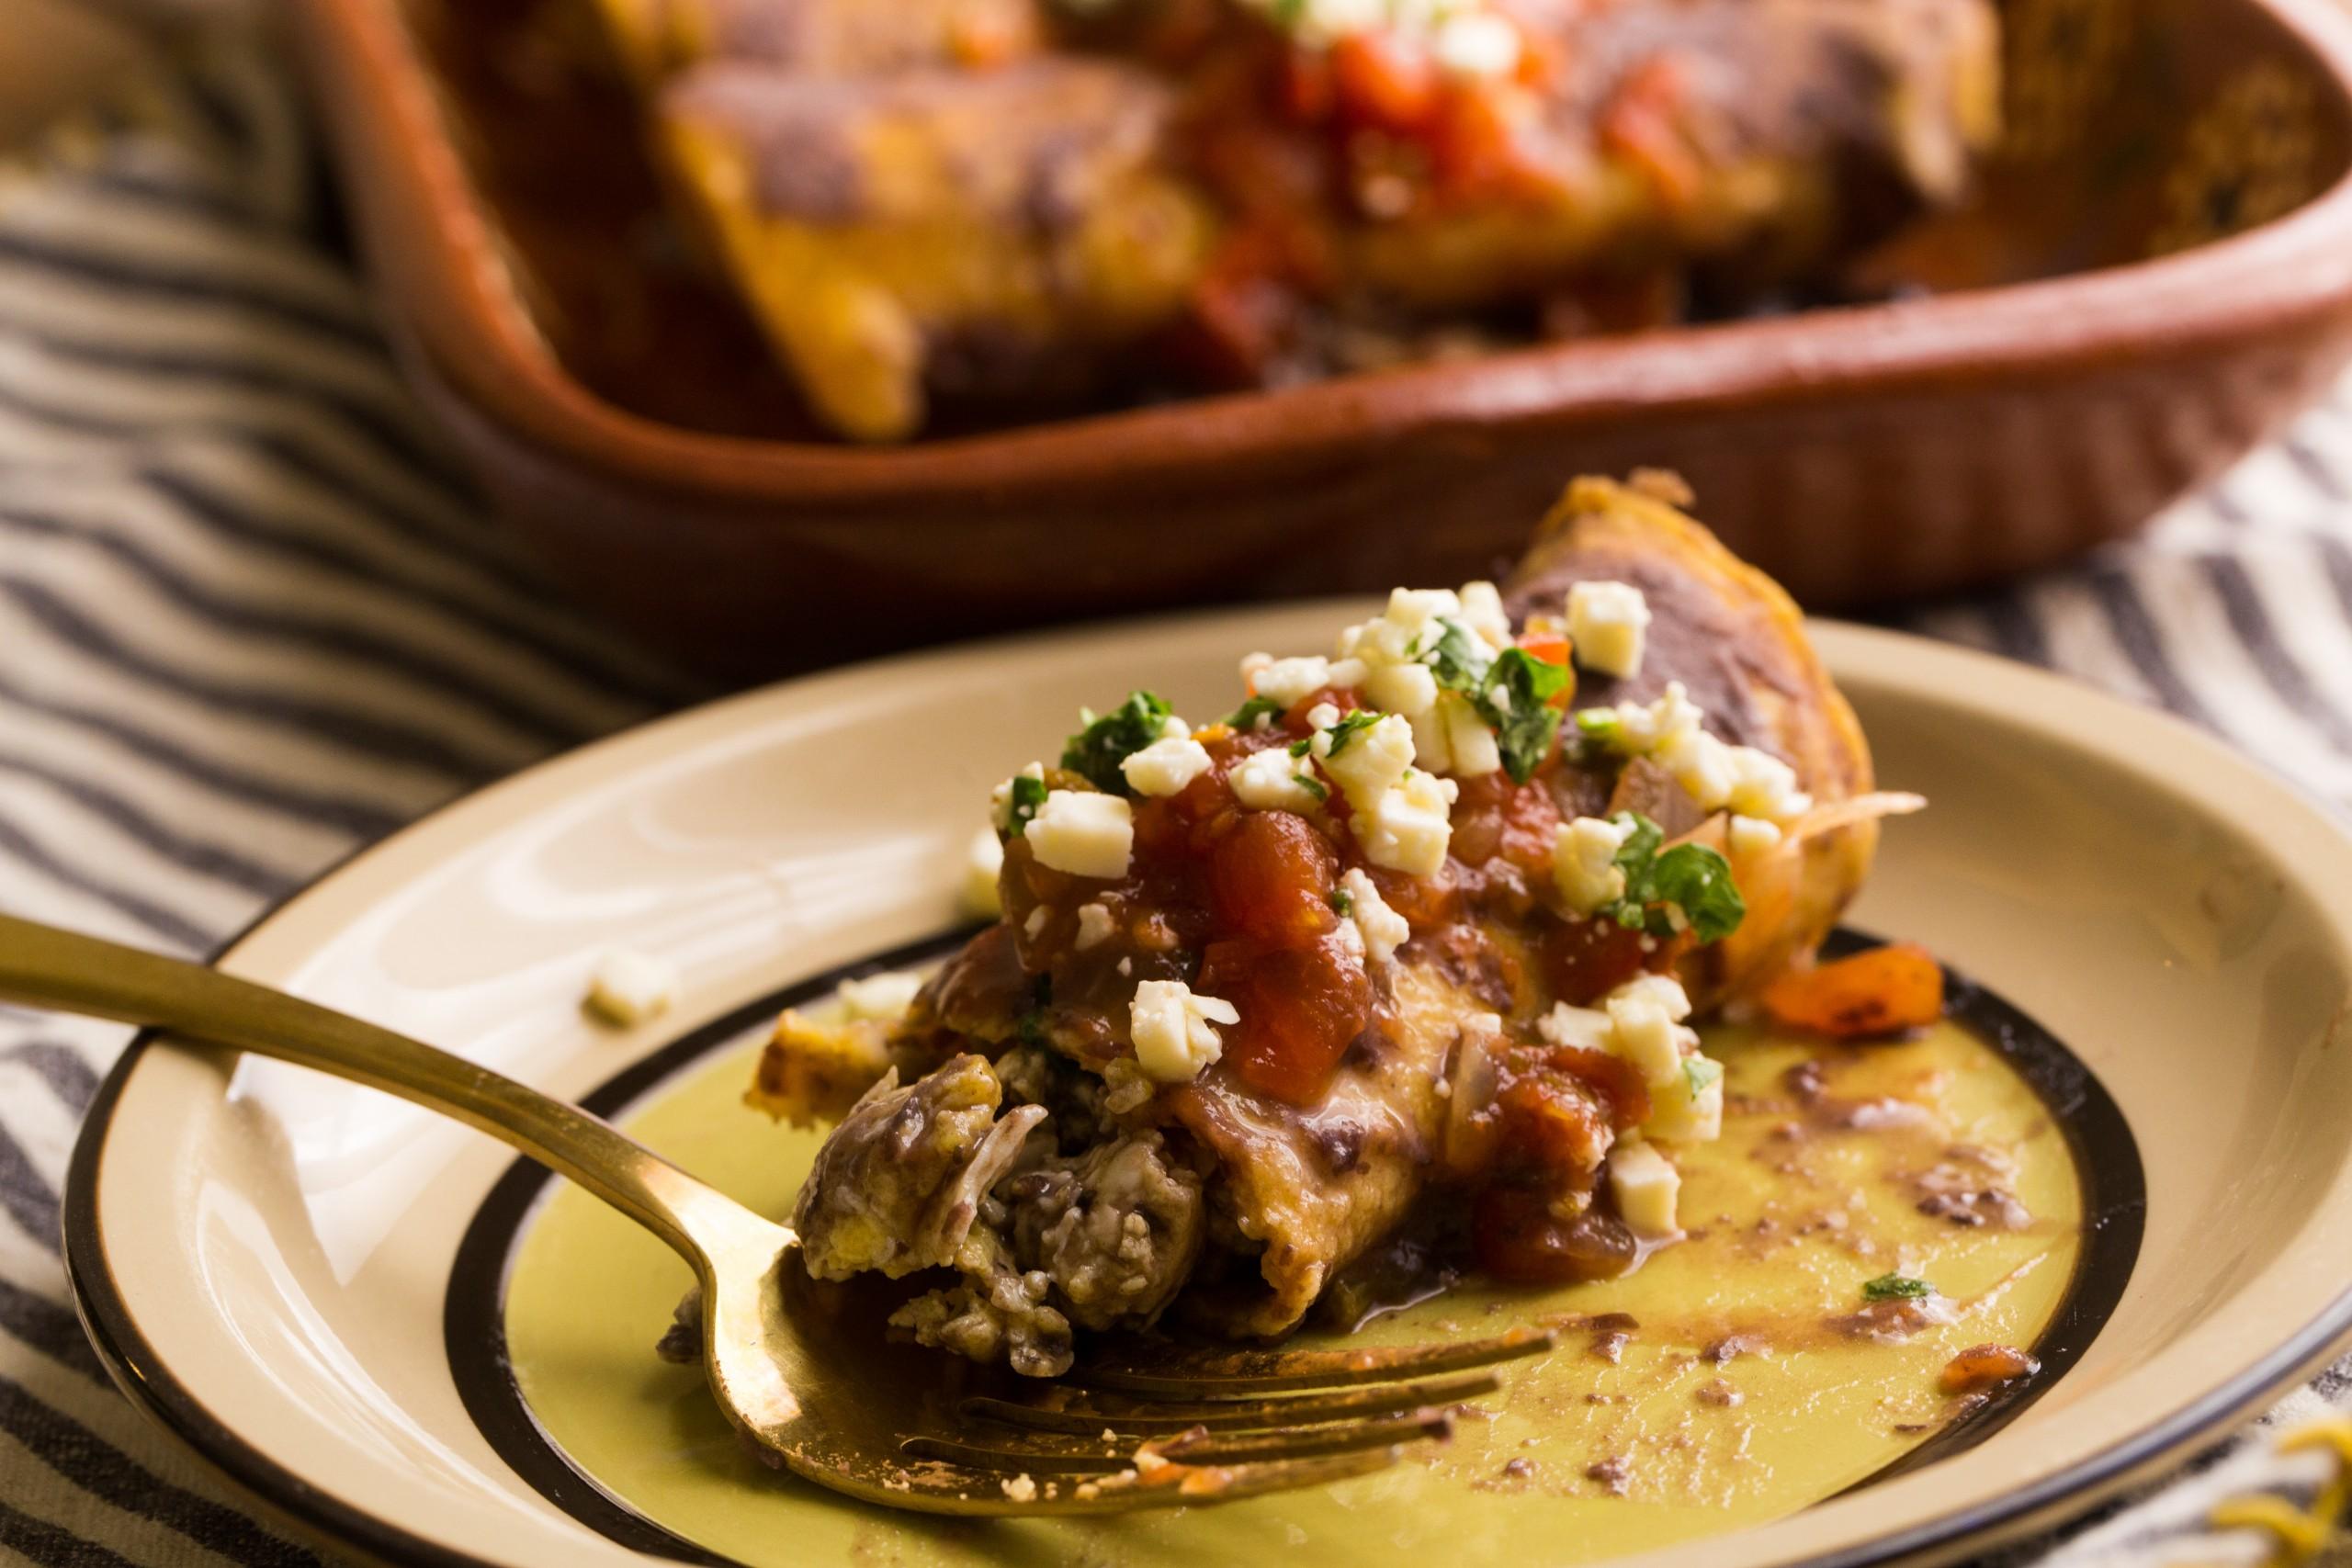 breakfast enchilada served on plate